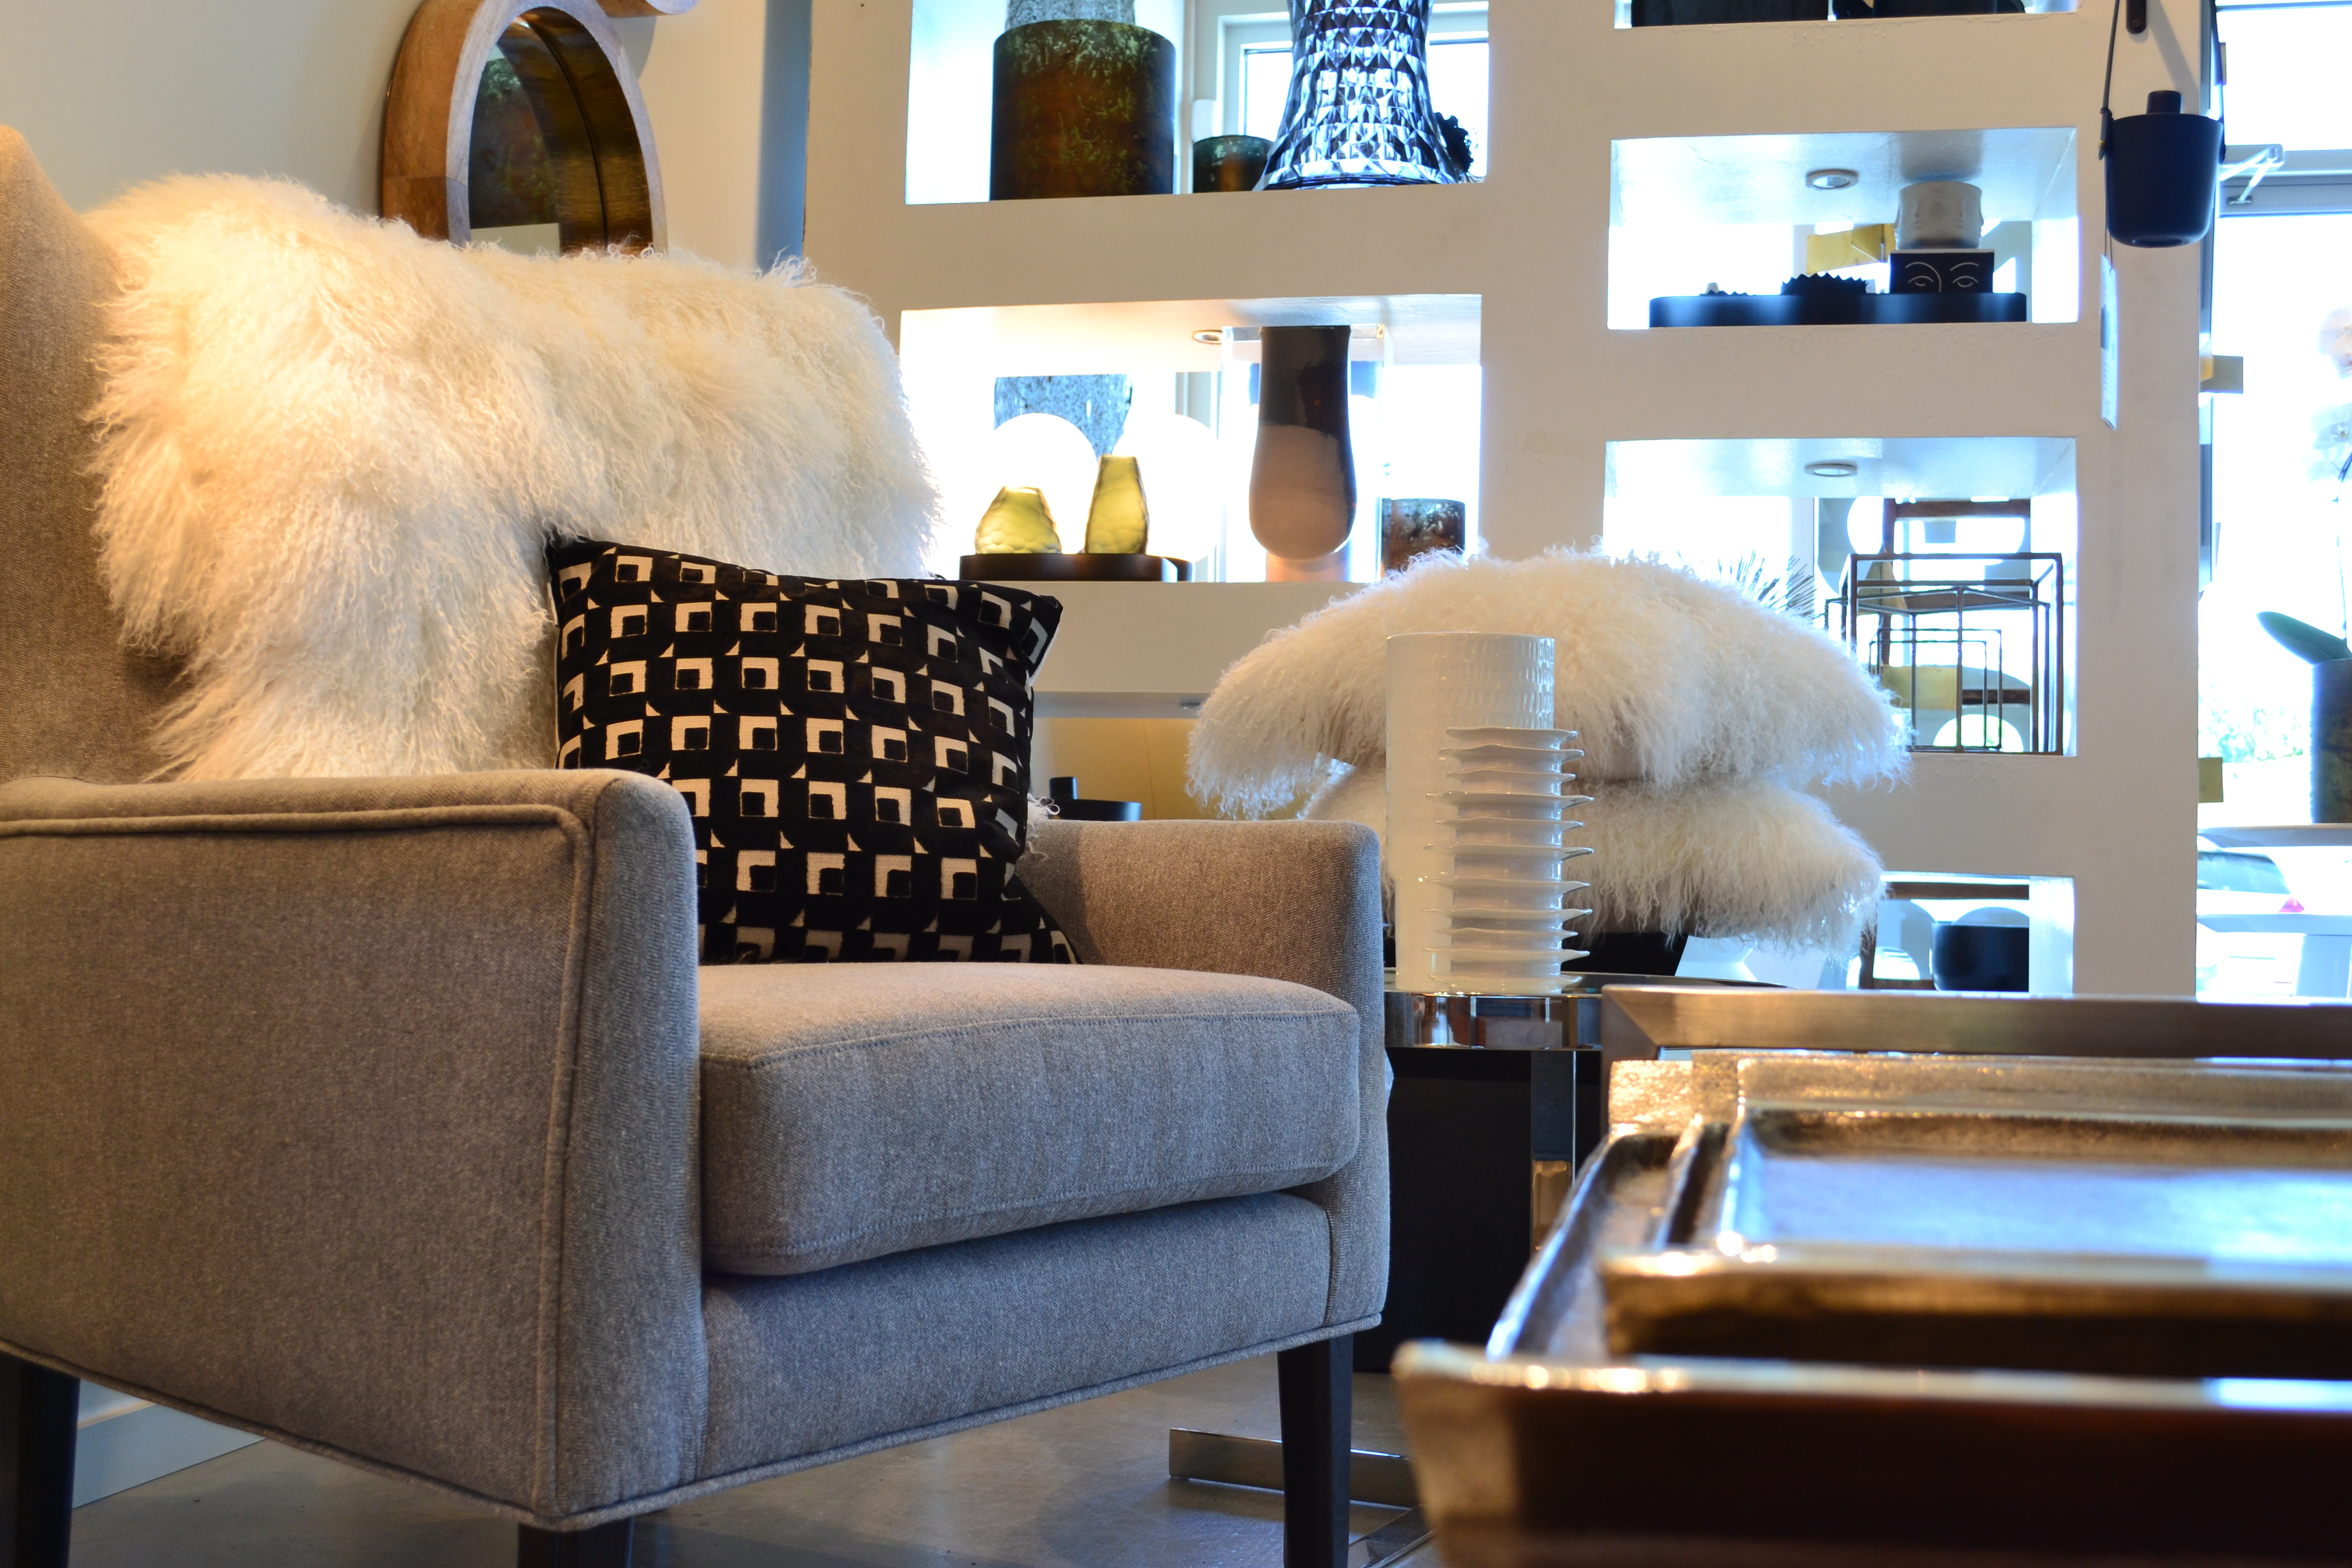 Astonishing Lexi Lake Modern Furniture Home Accessories Kelowna Home Interior And Landscaping Mentranervesignezvosmurscom